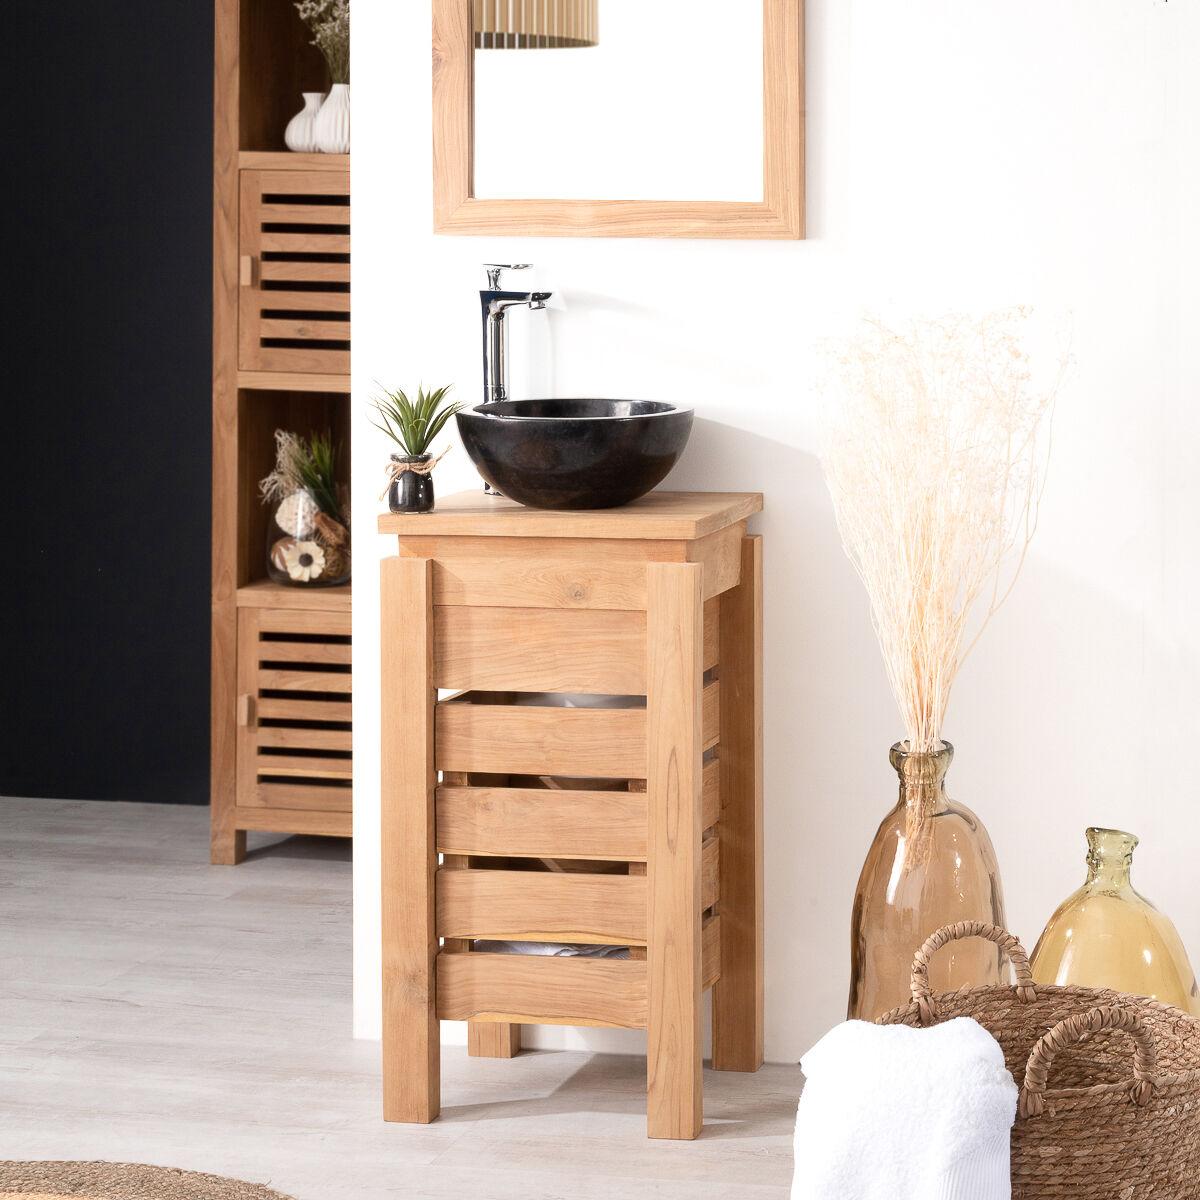 Wanda Collection Petit meuble salle de bain WC ZEN en teck 40cm